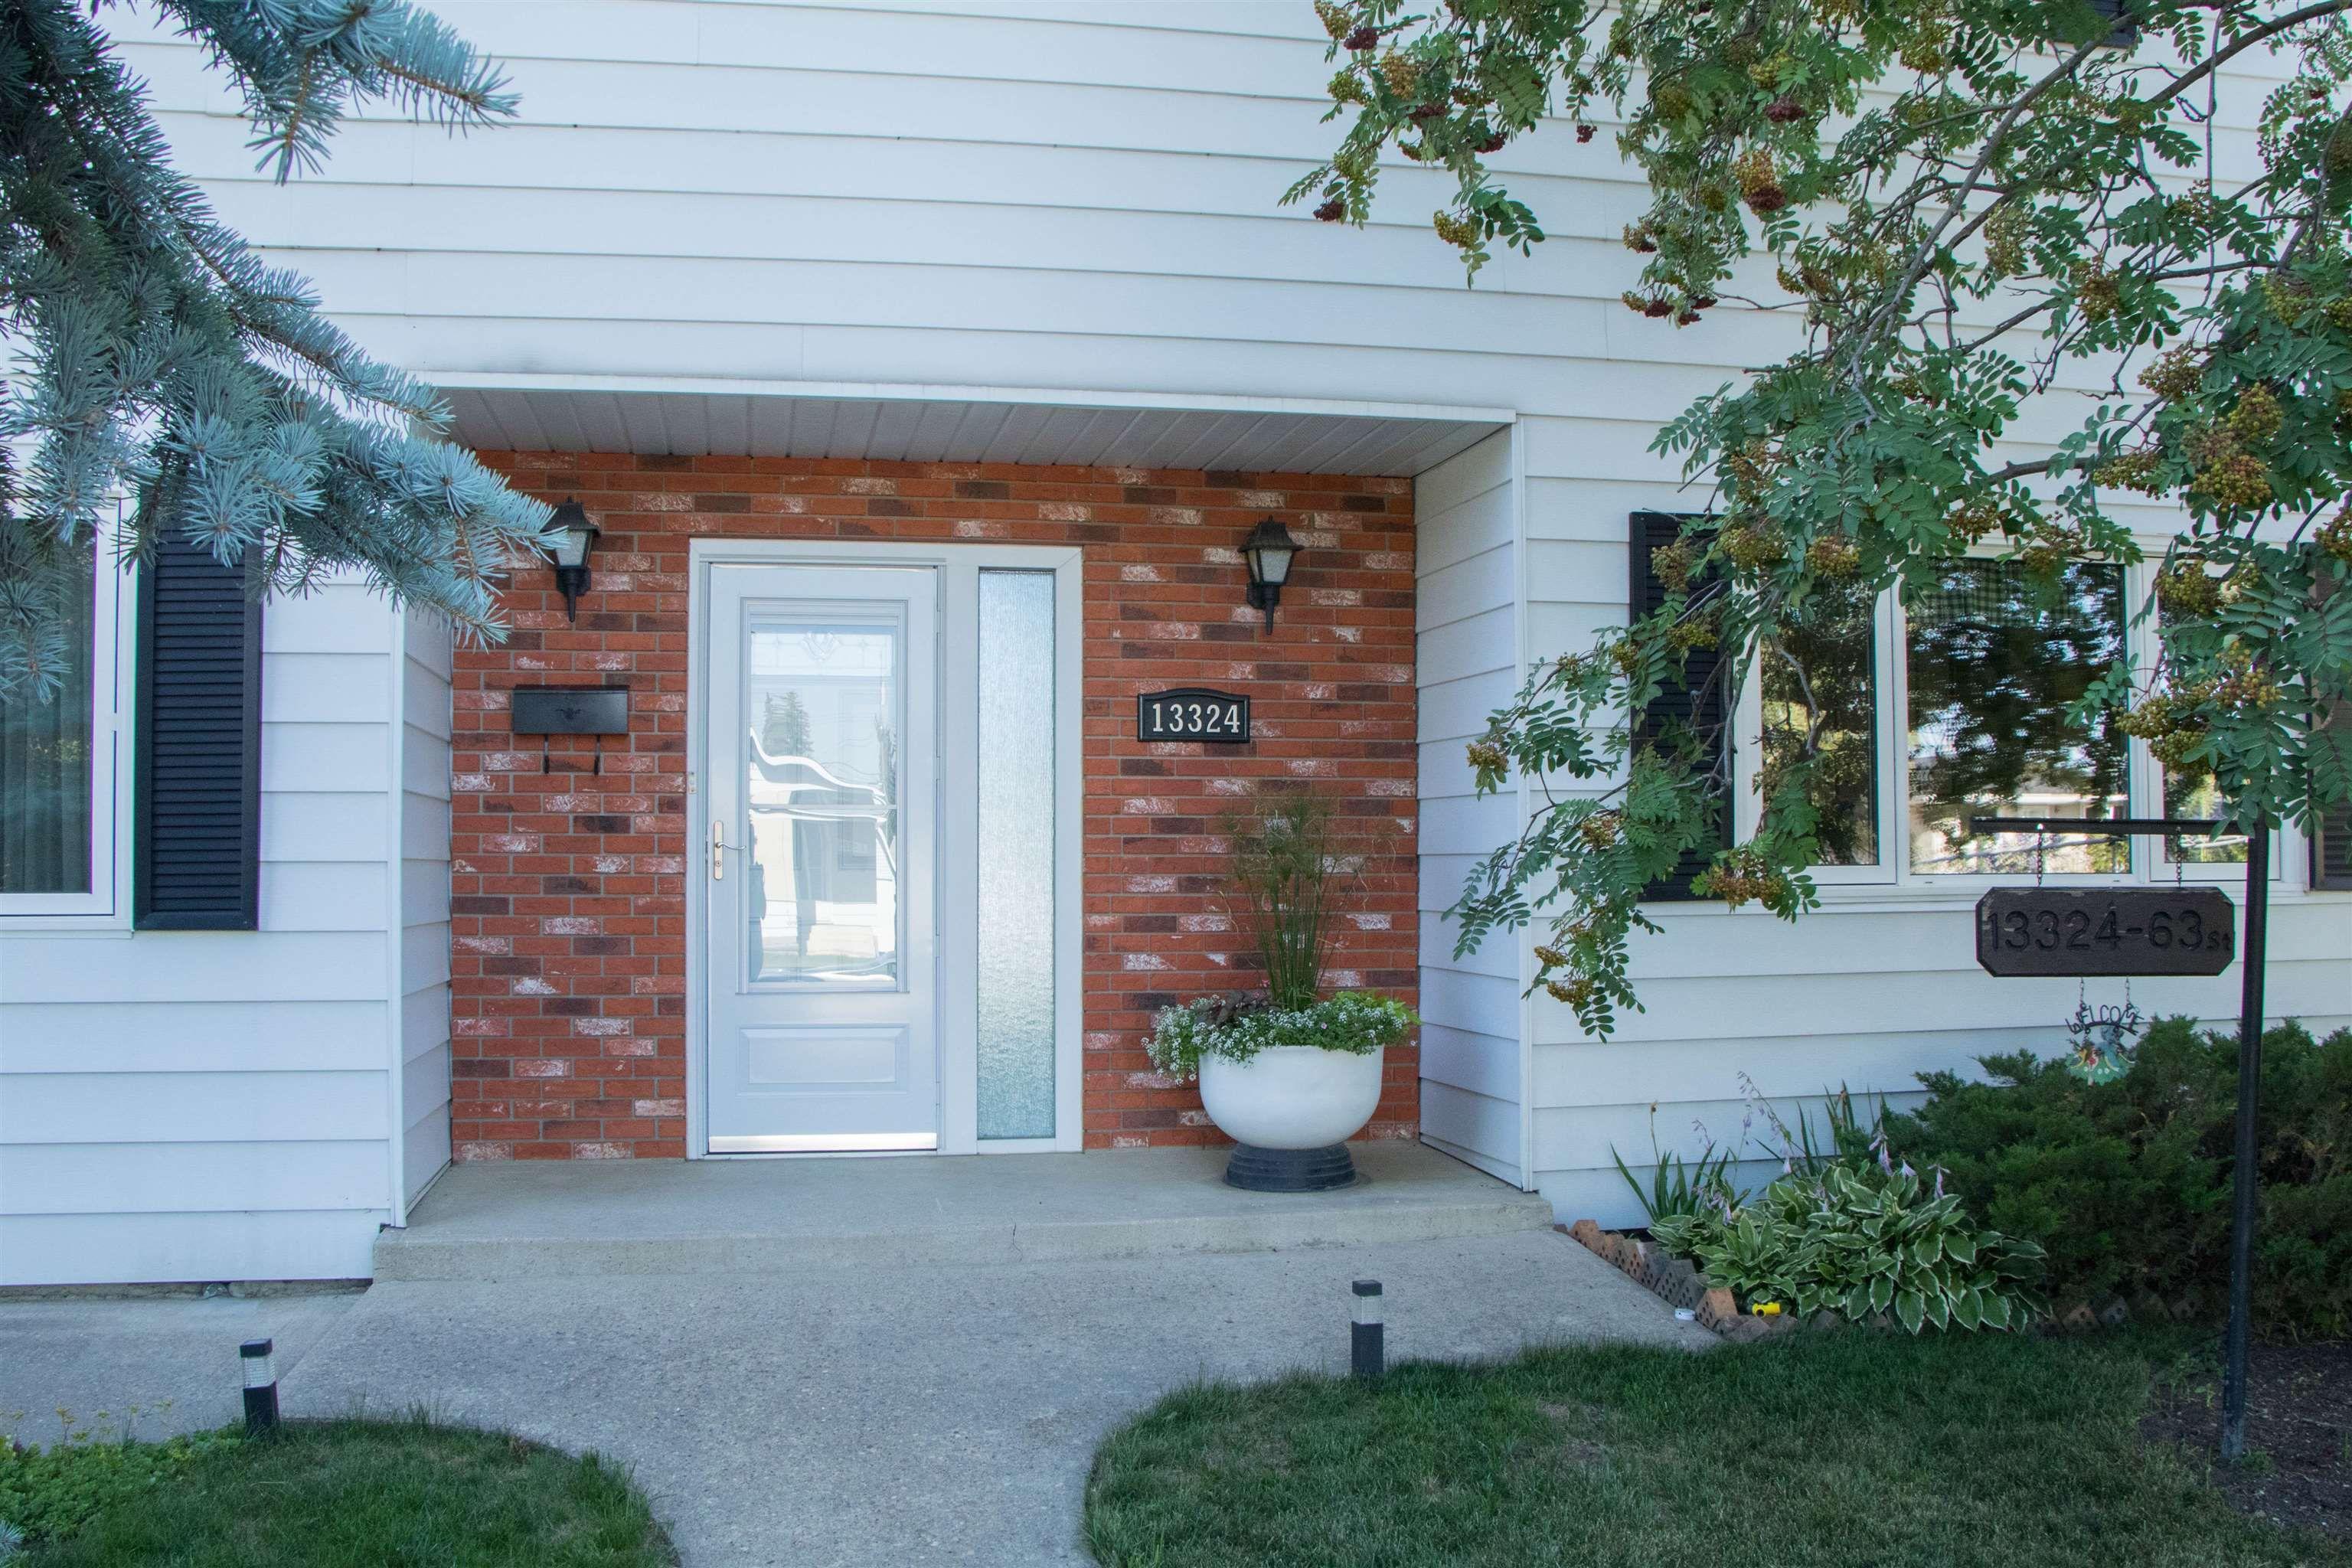 Main Photo: 13324 63 Street in Edmonton: Zone 02 House for sale : MLS®# E4256894